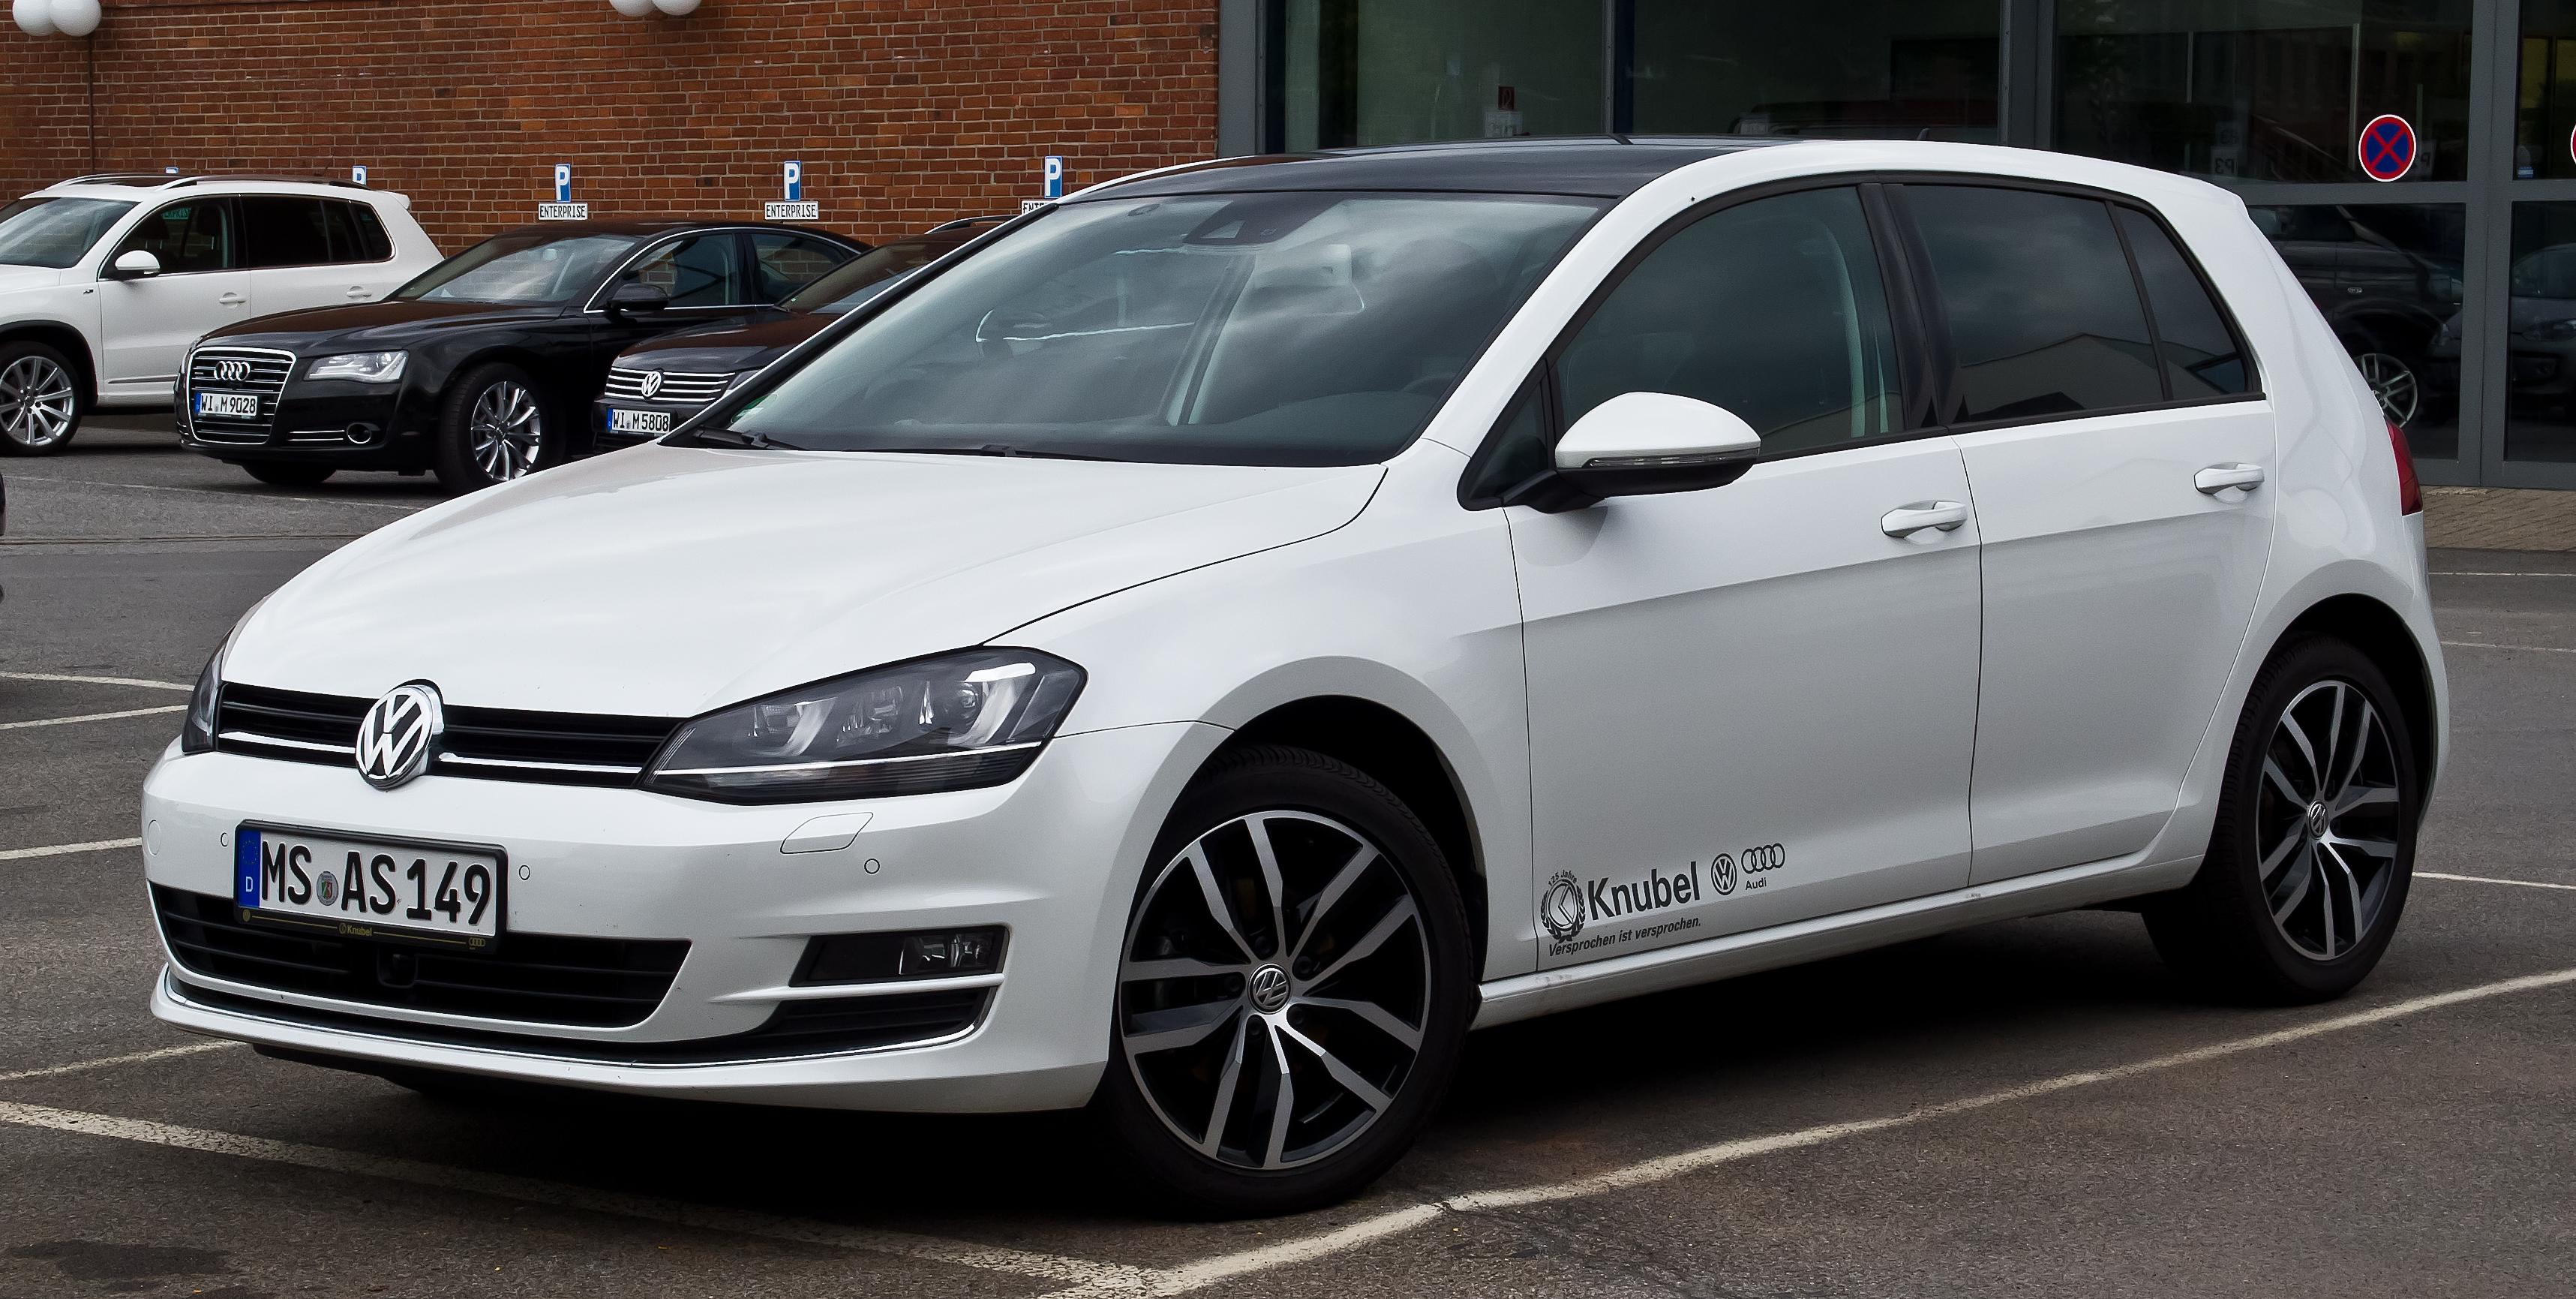 2014 Volkswagen Jetta SportWagen - Price, Photos, Reviews & Features